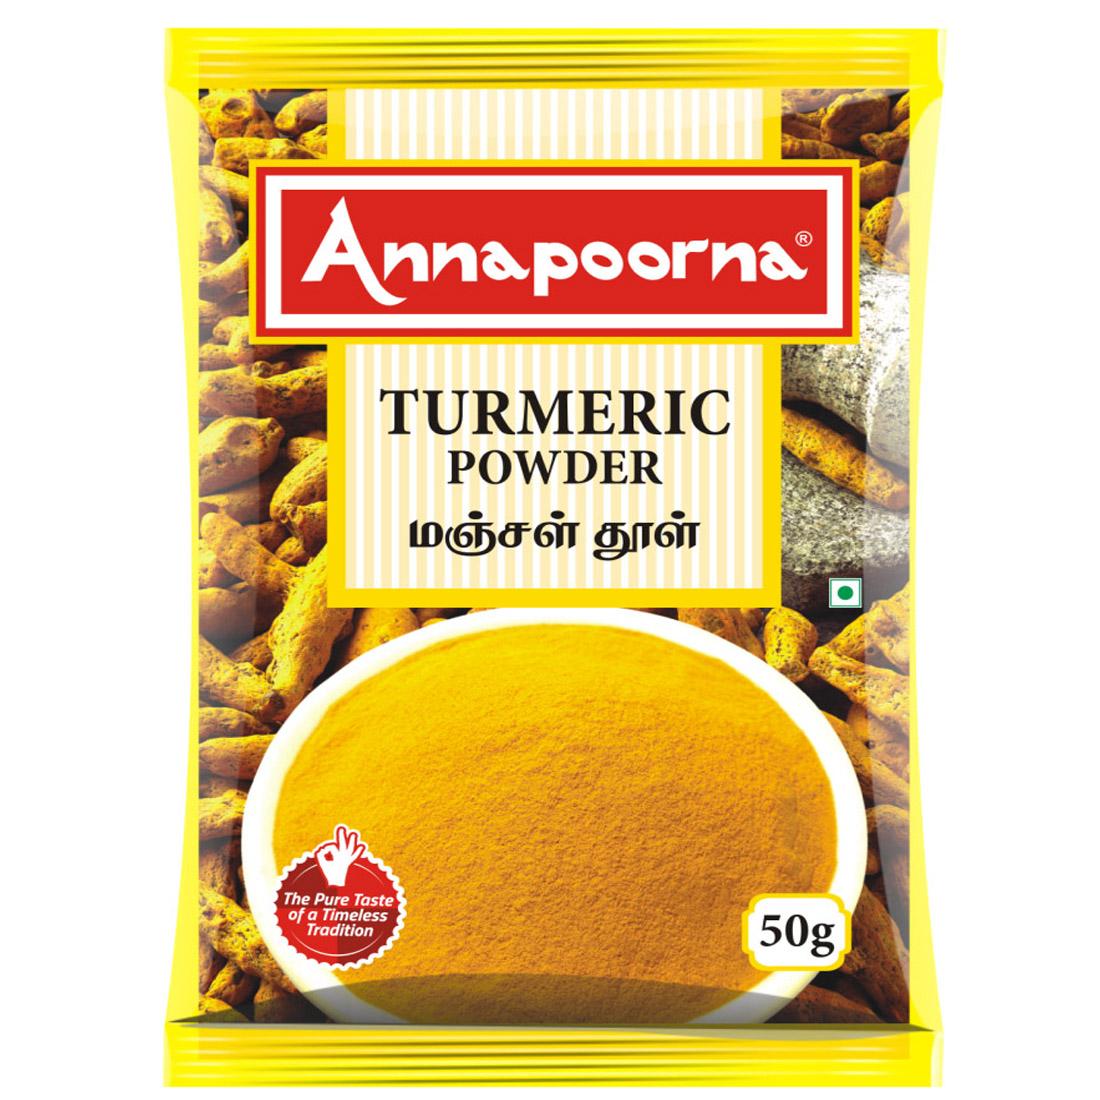 Annapoorna Turmeric Powder - 500 gm